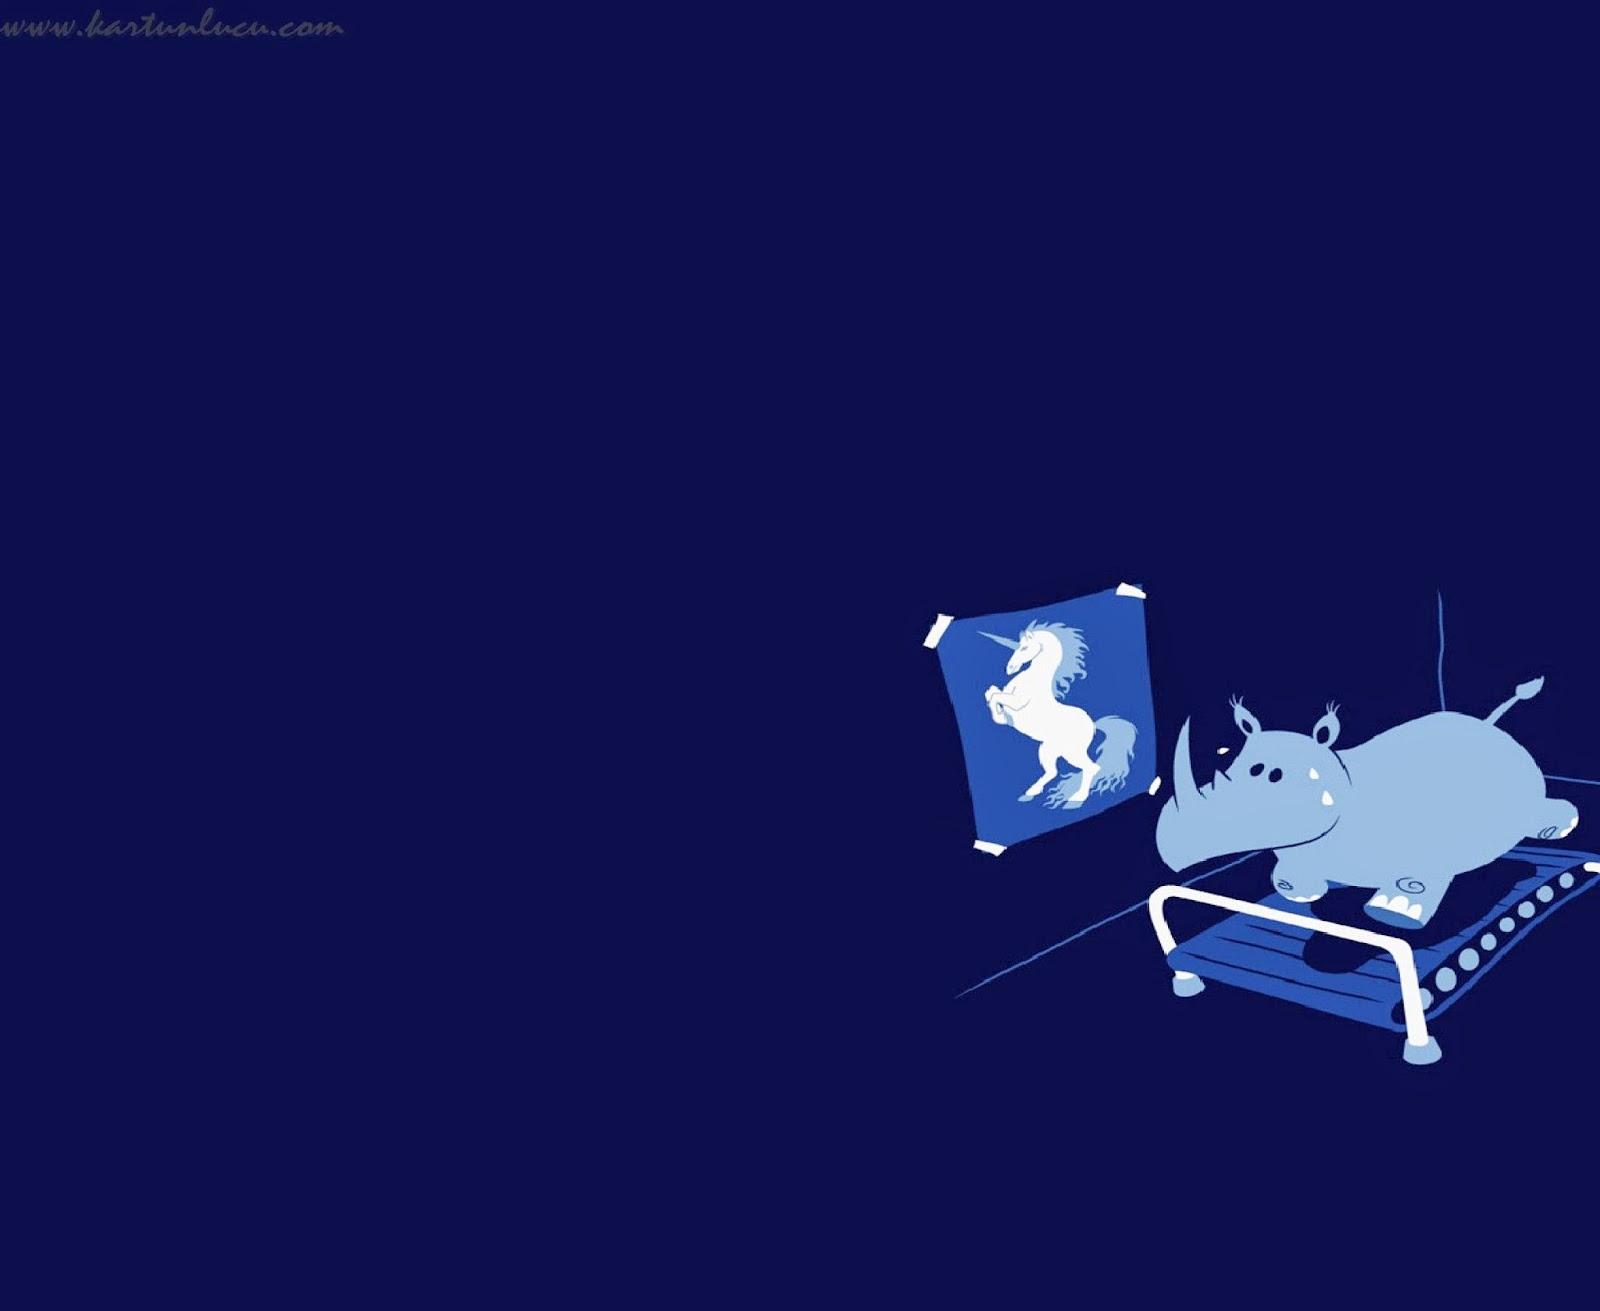 google wallpaper lucu,blue,cobalt blue,sky,electric blue,animation